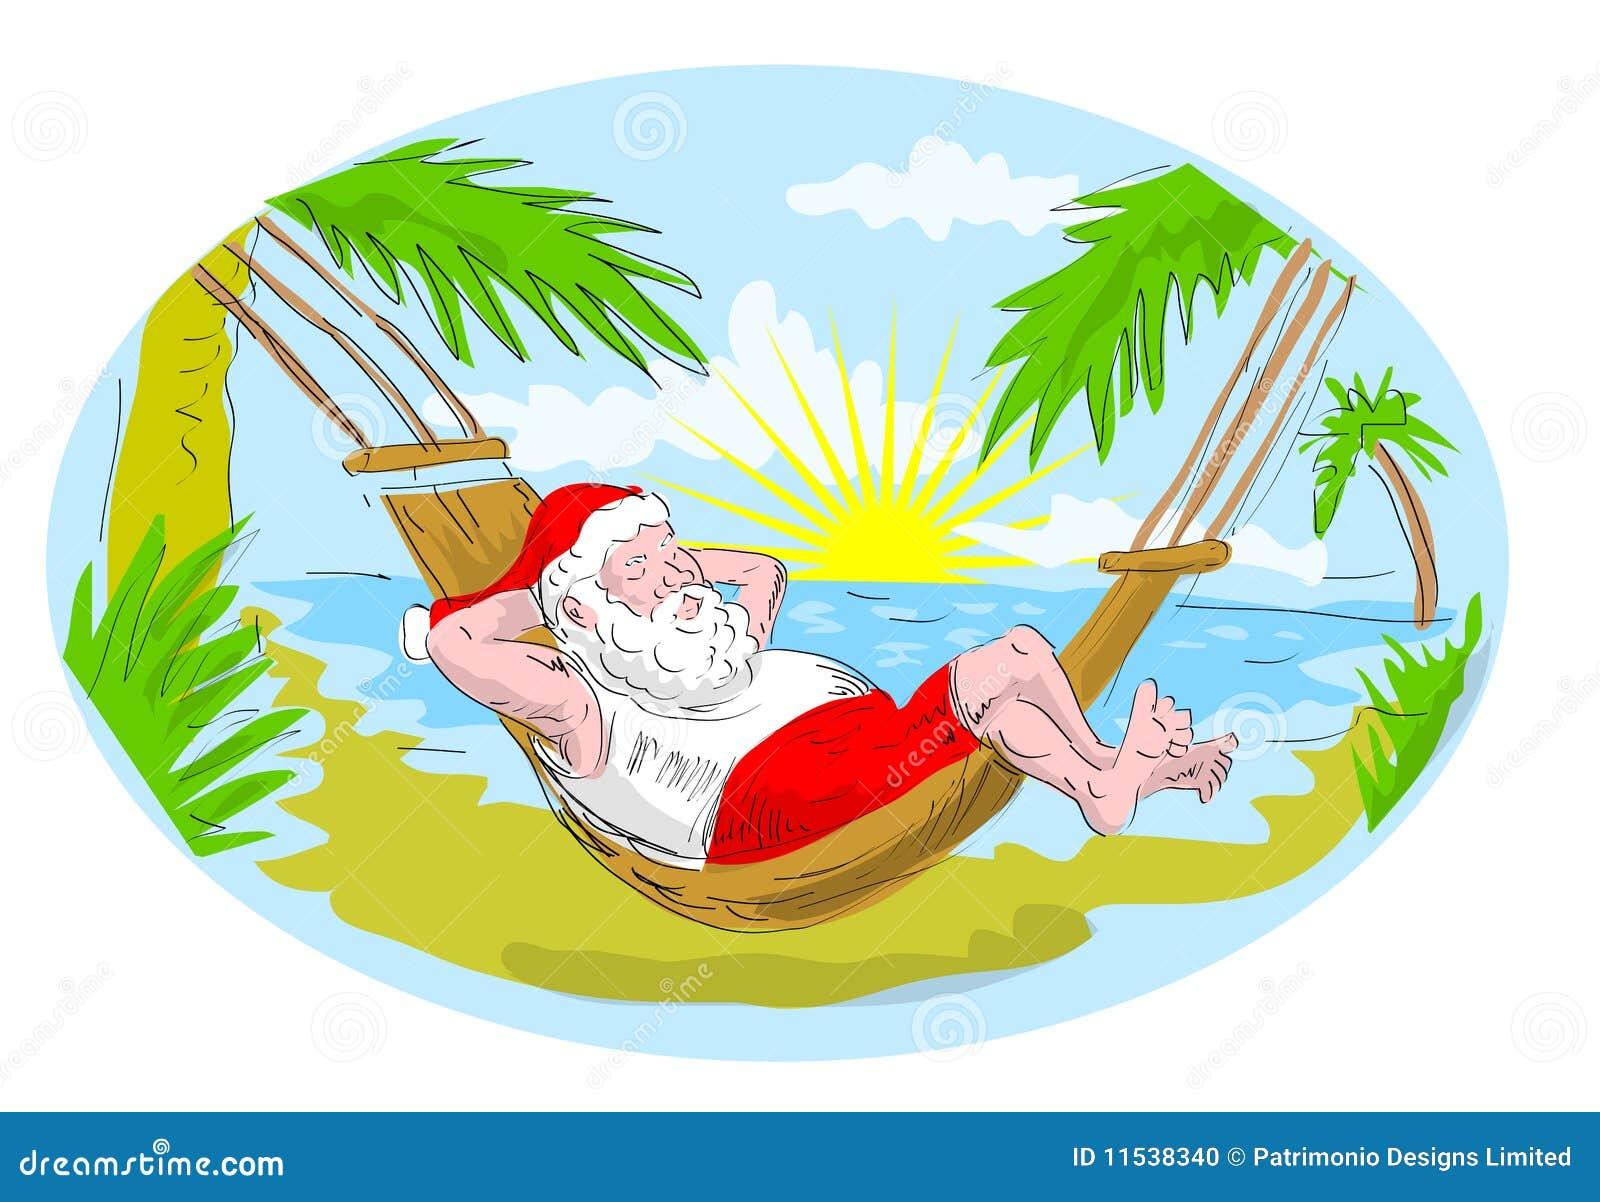 free clipart santa on the beach - photo #34